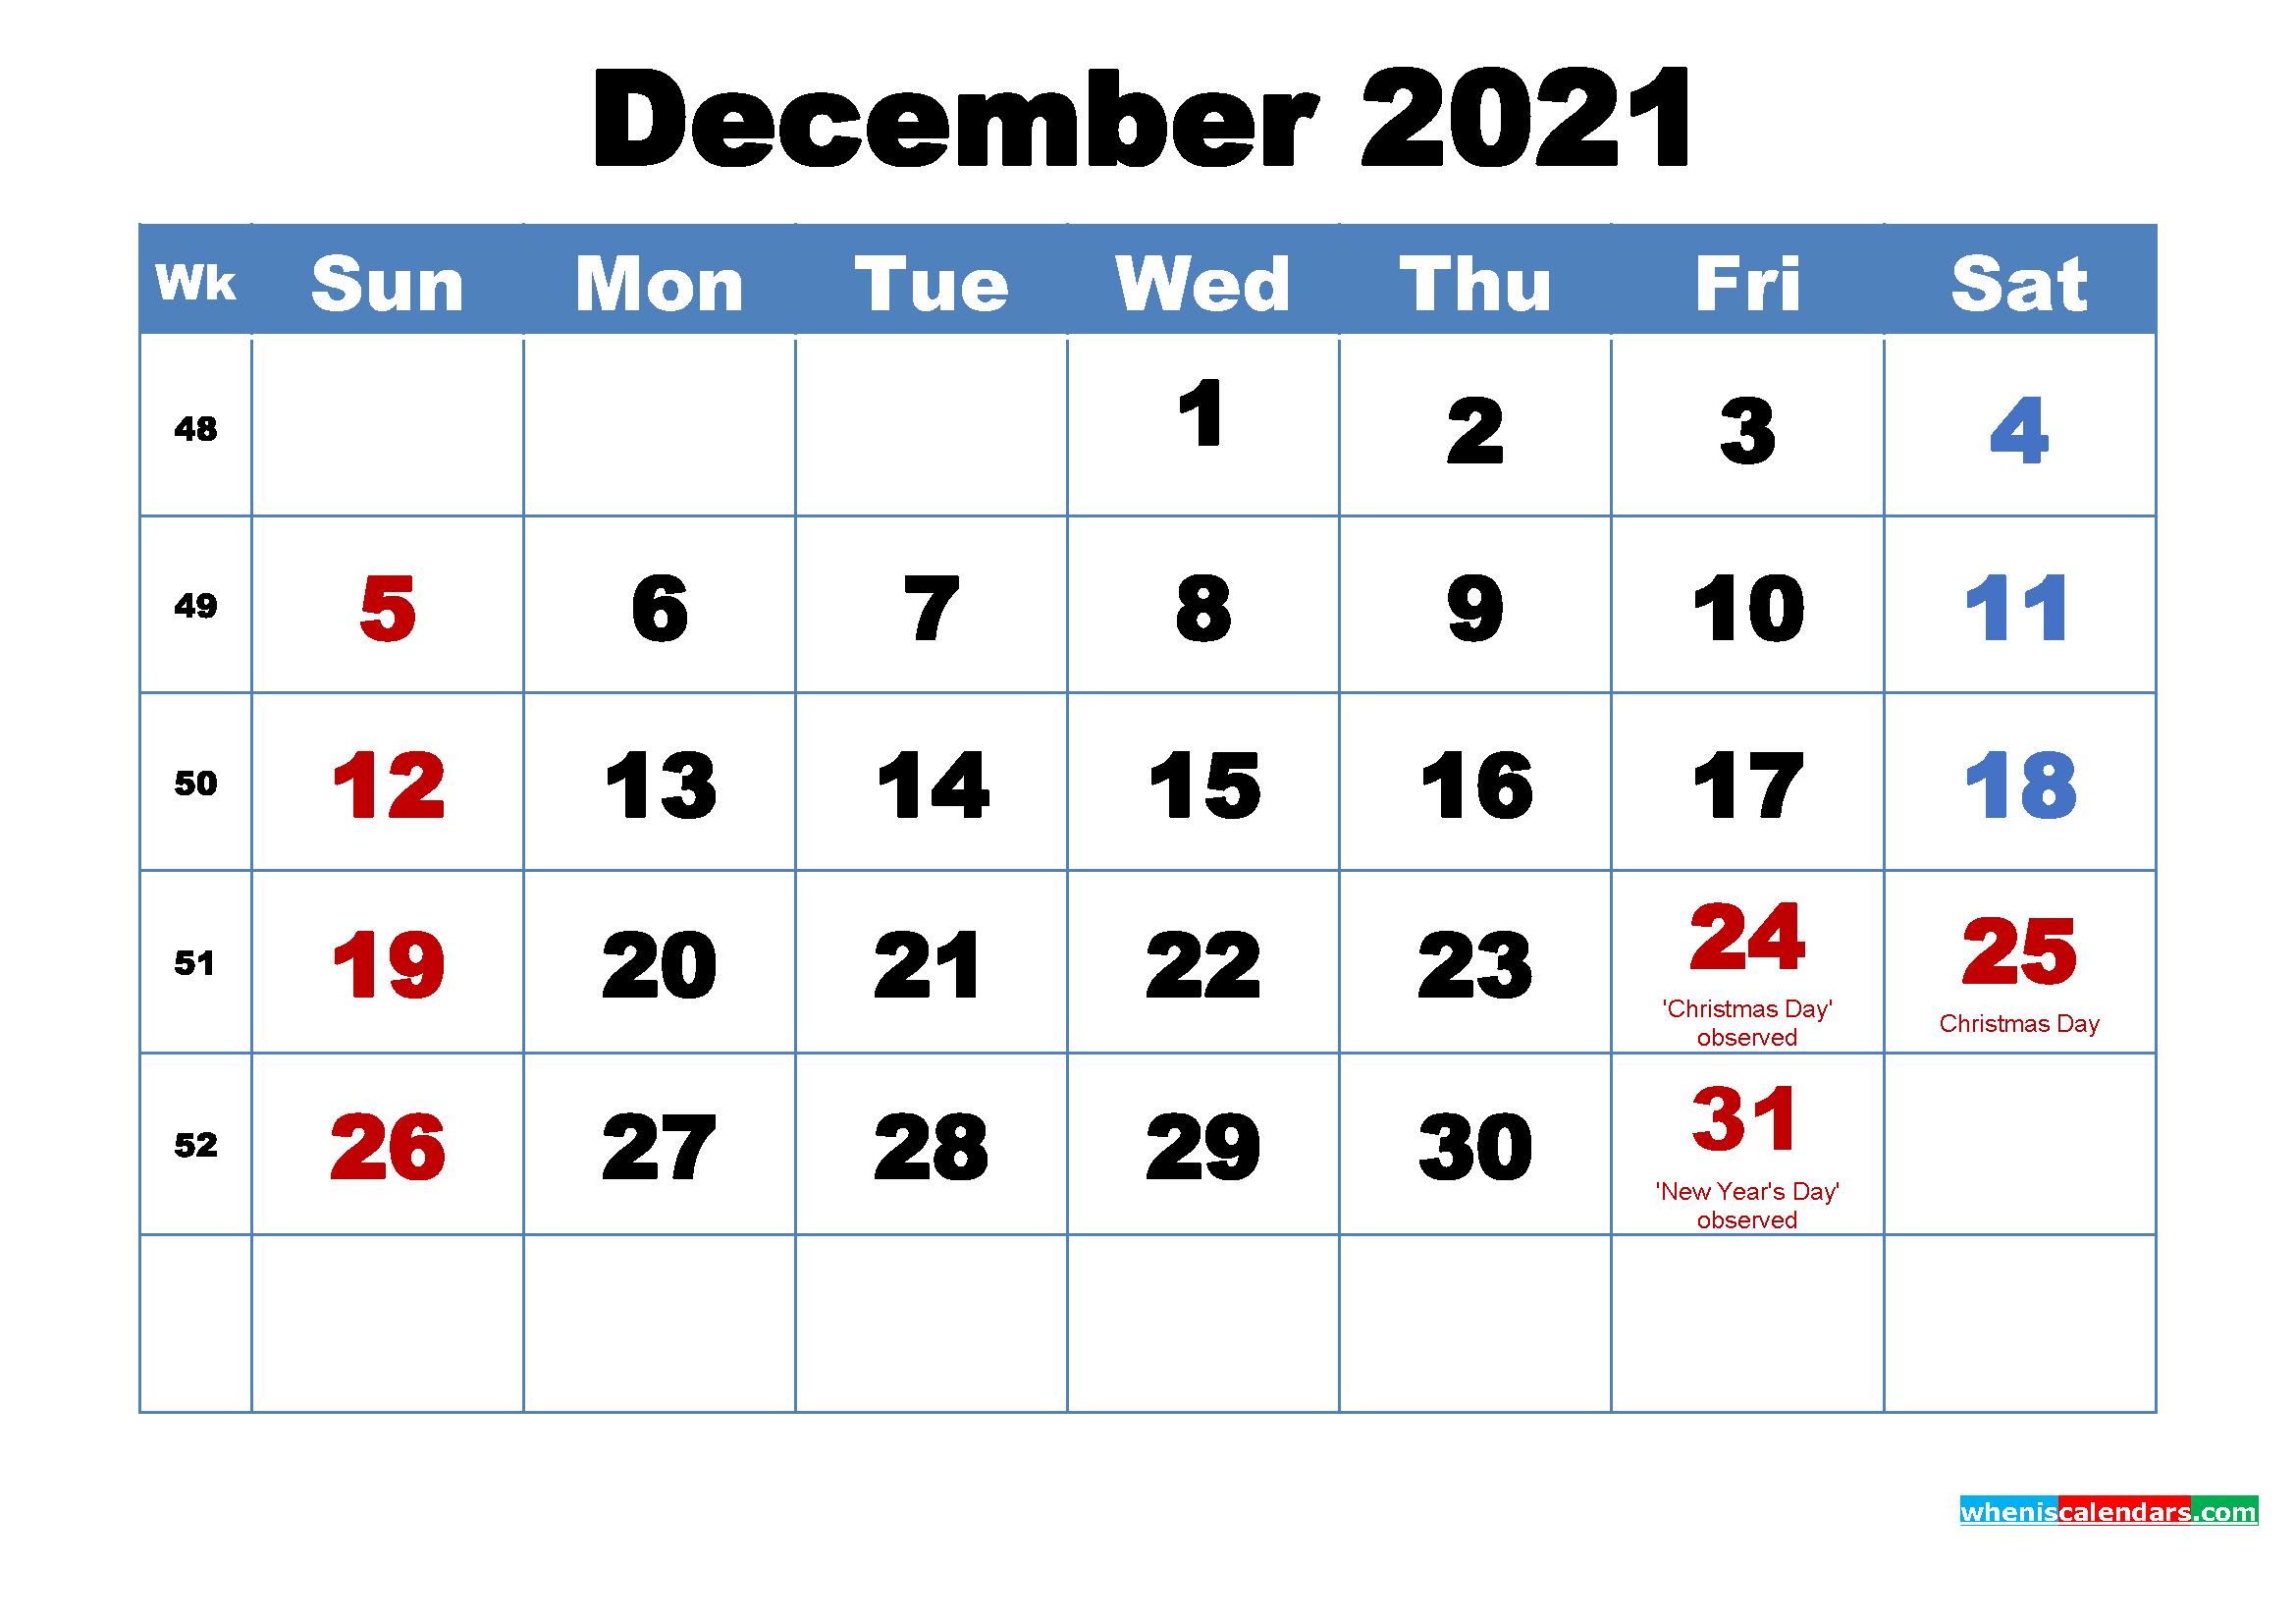 December Christmas 2021 Calendar December Holidays Google Search